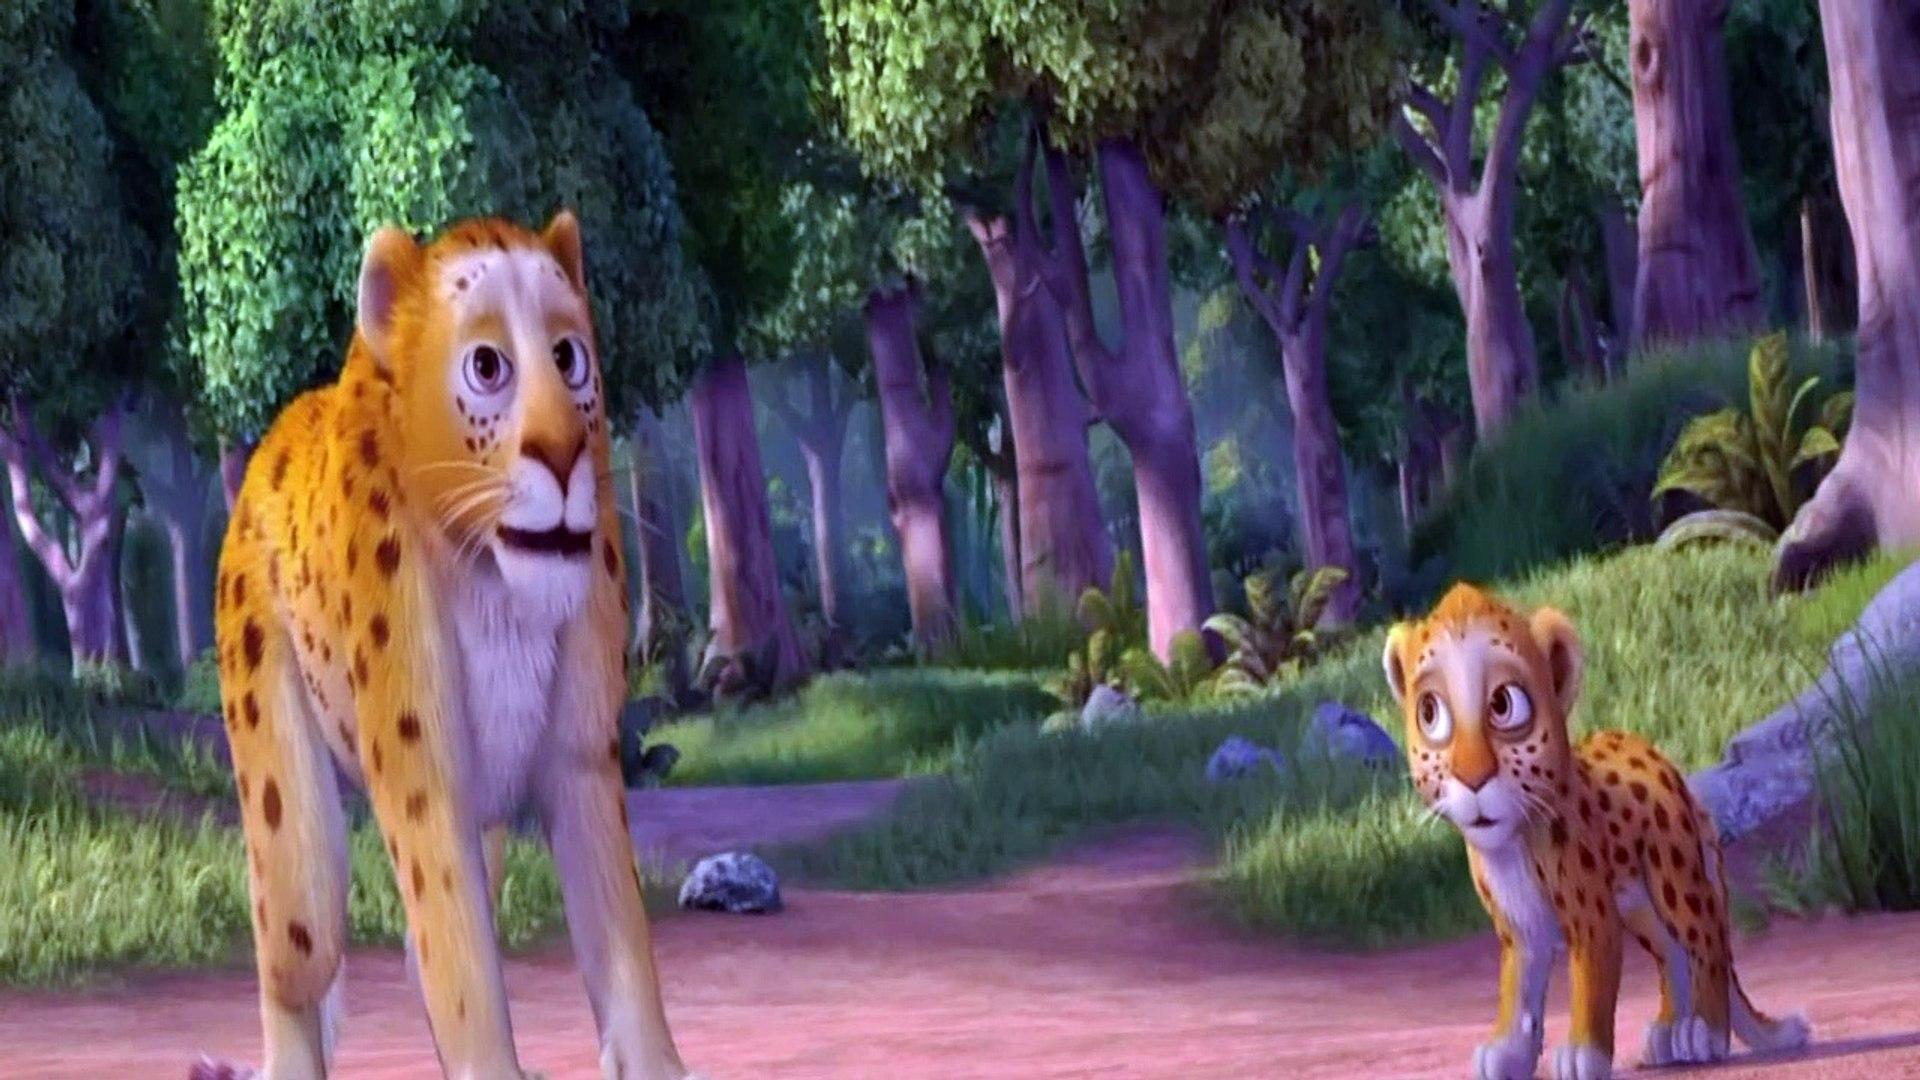 New Animation Movies 2020 Full Movies English - Kids movies - Comedy Movies.